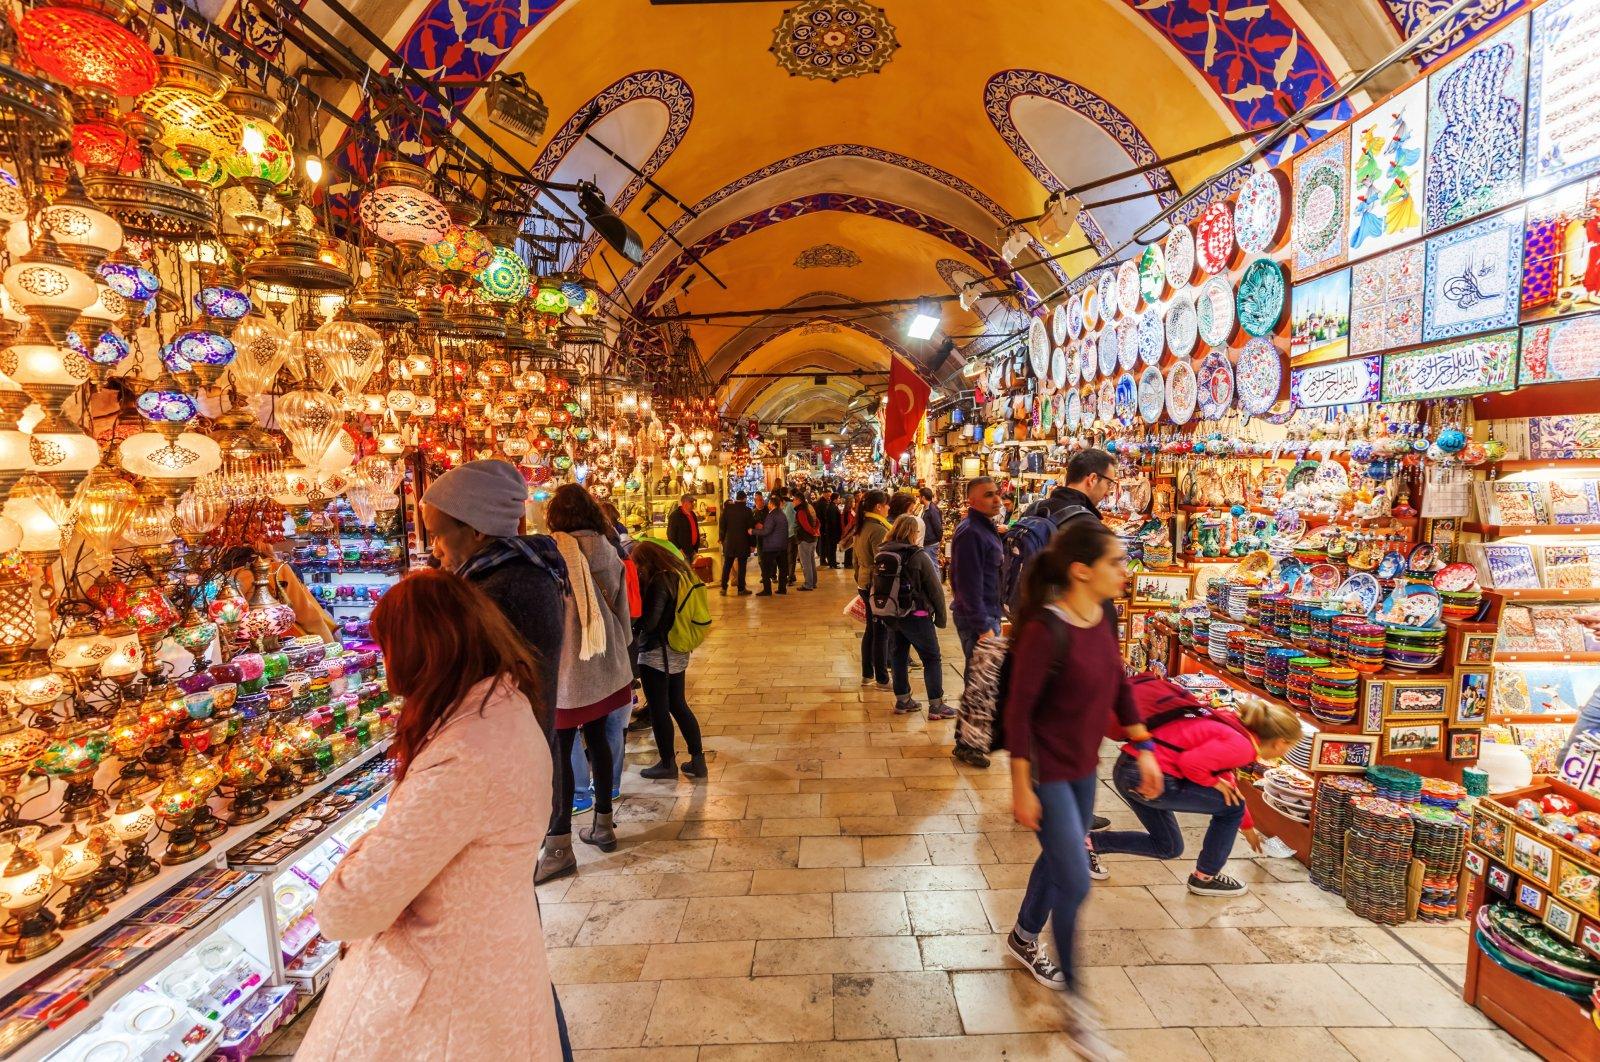 People visit the Grand Bazaar, Istanbul, April 10, 2015. (Shutterstock Photo)